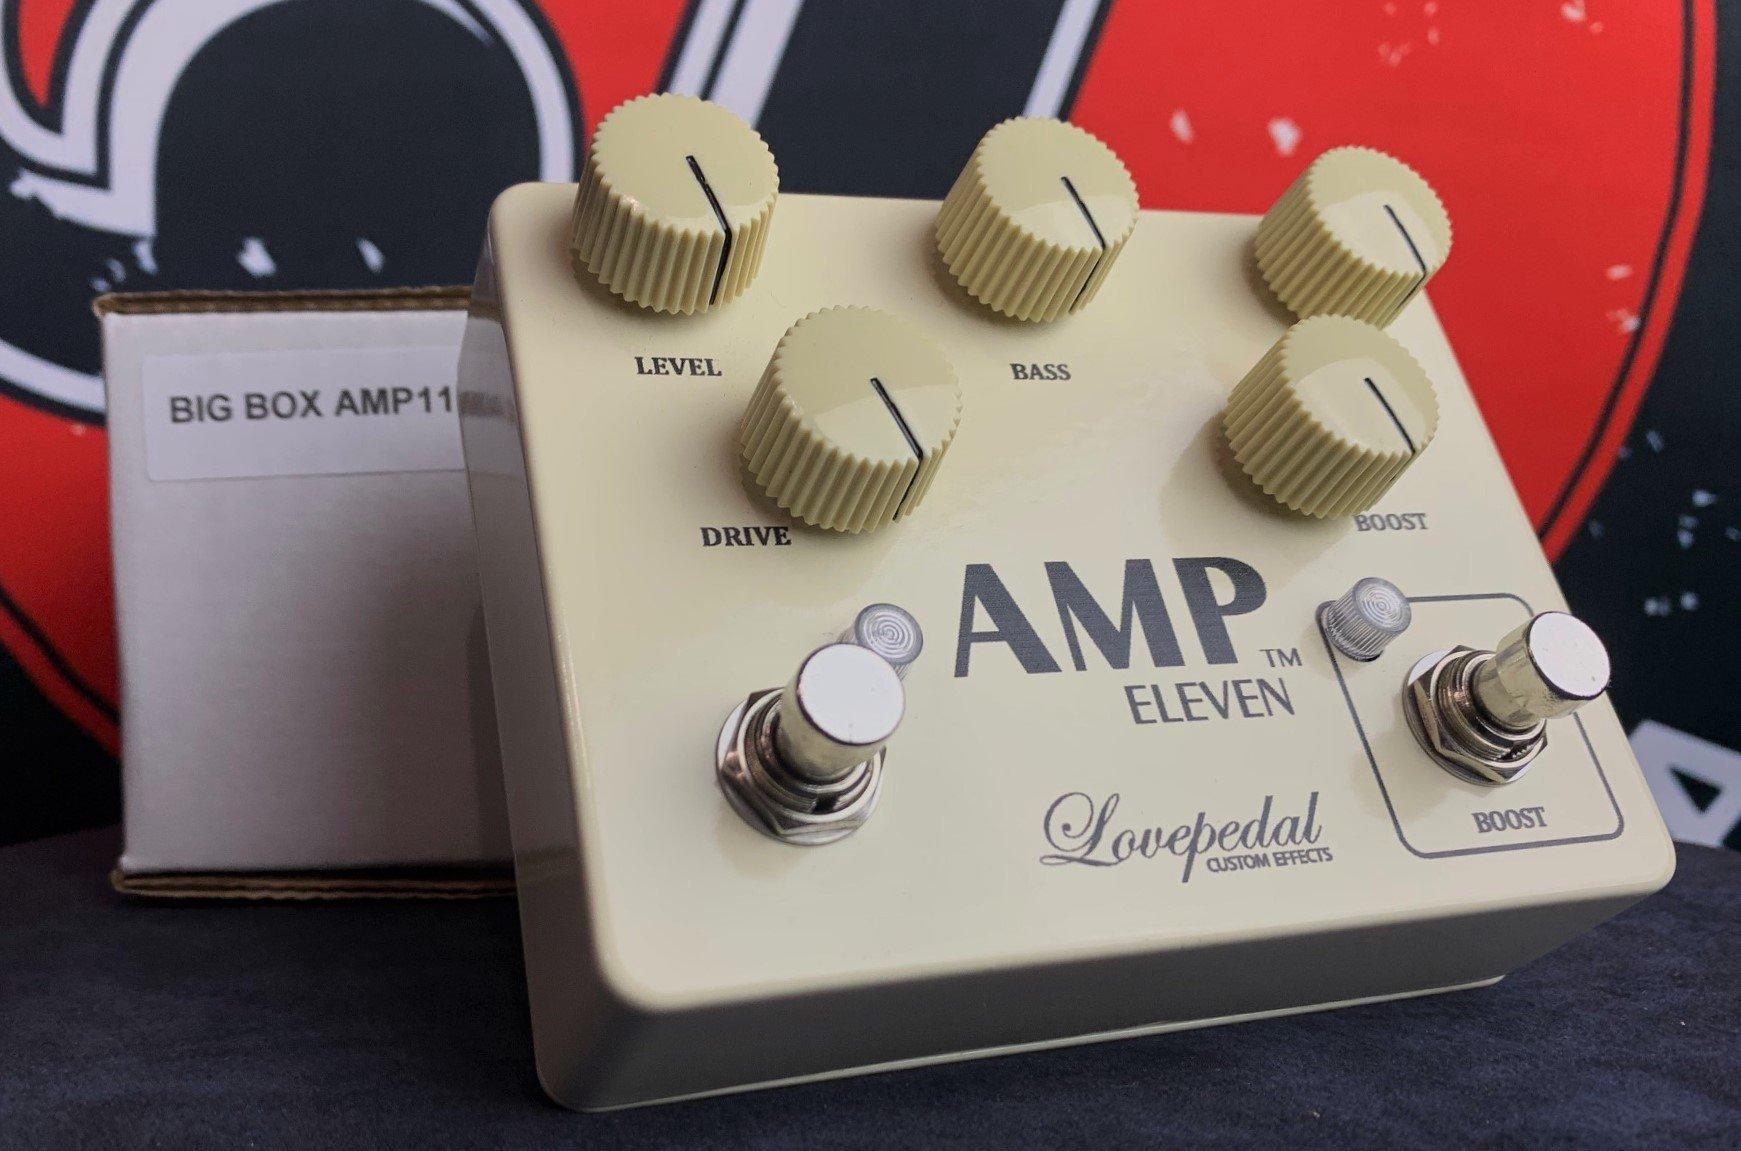 Lovepedal Amp Eleven w/Box